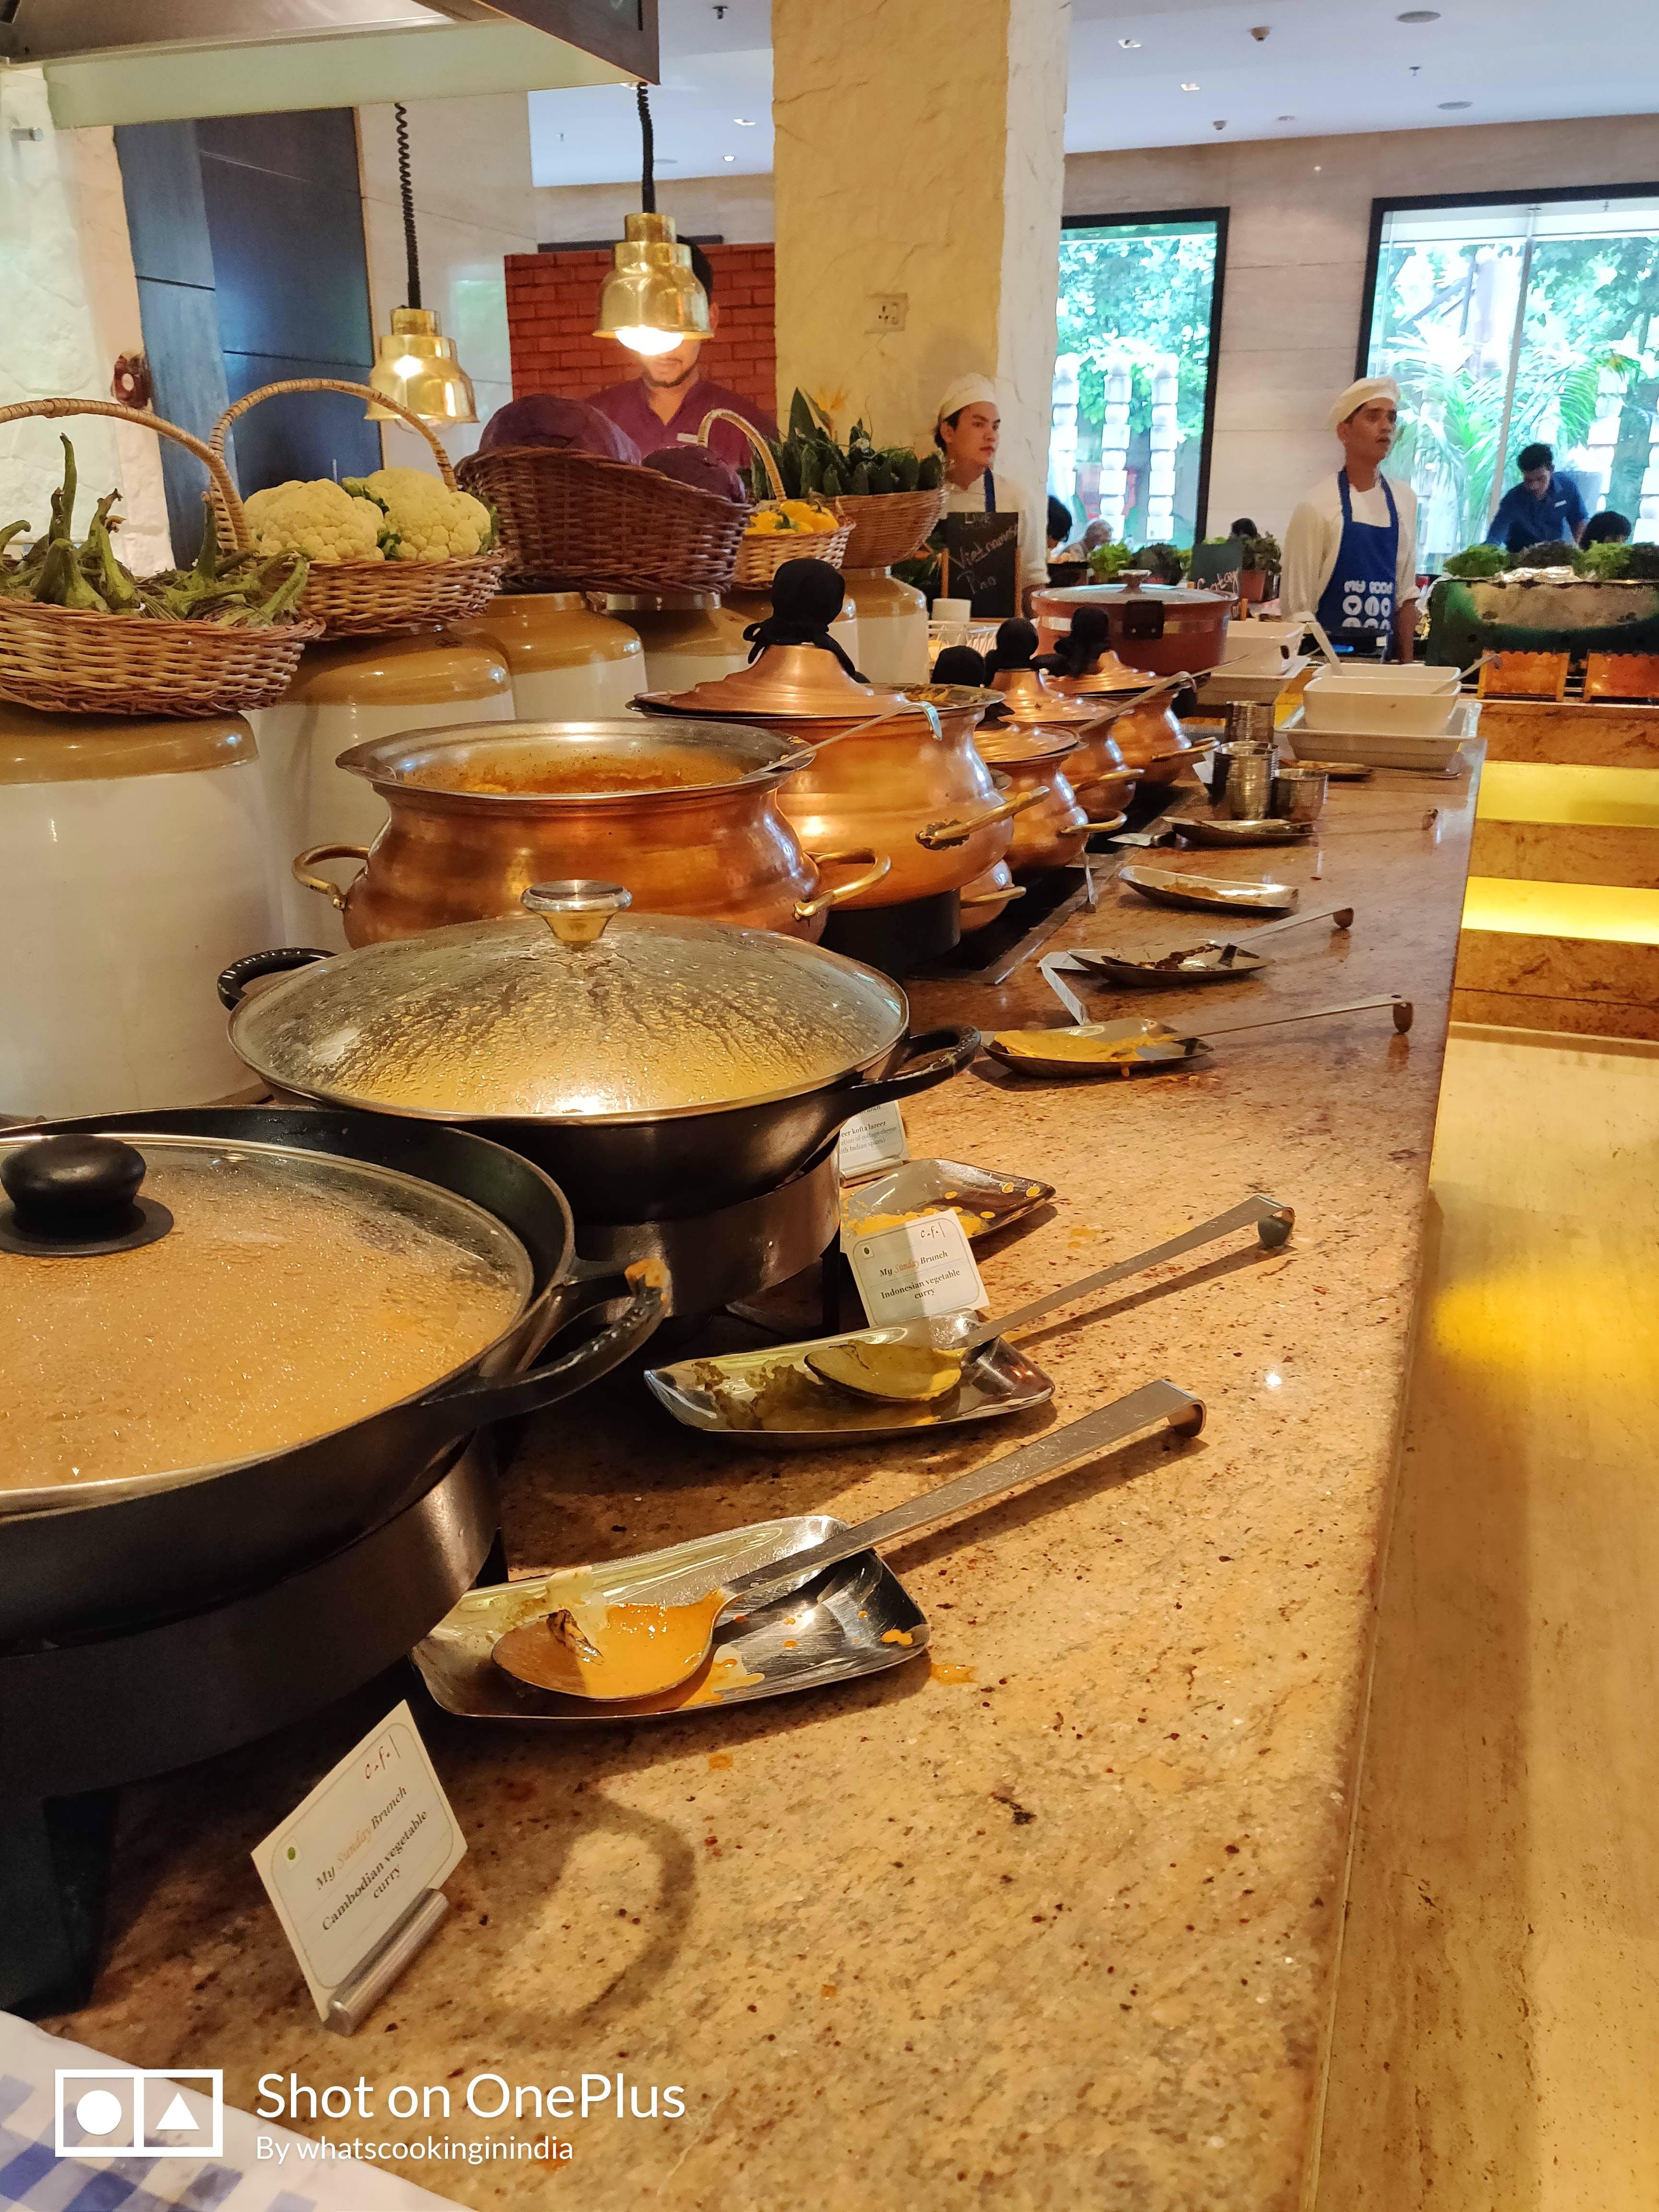 Buffet,Room,Restaurant,Furniture,Meal,Interior design,Cookware and bakeware